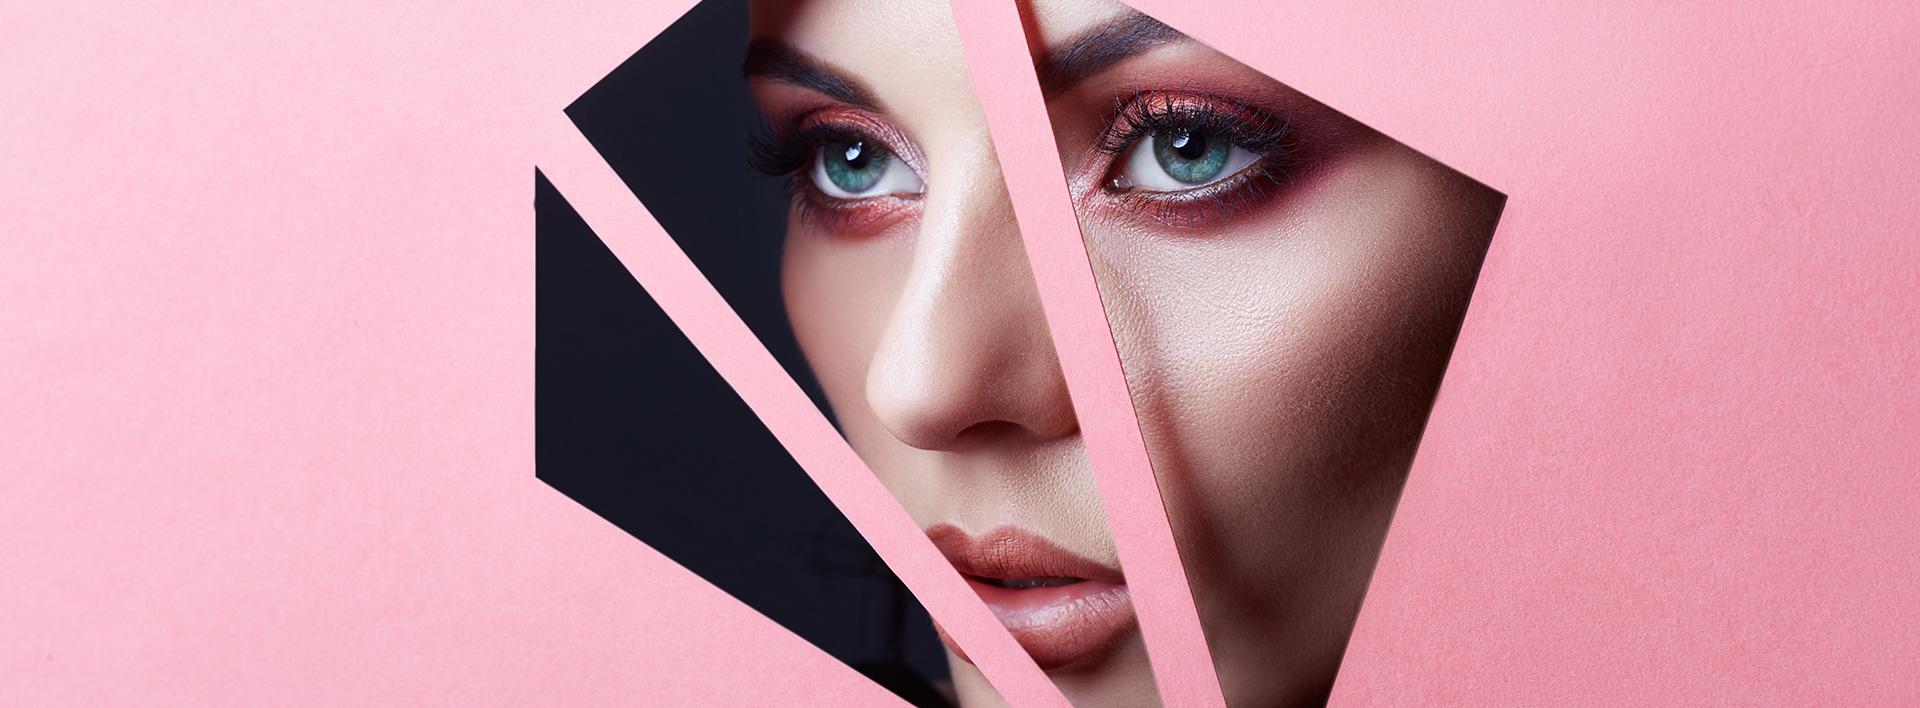 Make-up Labbra